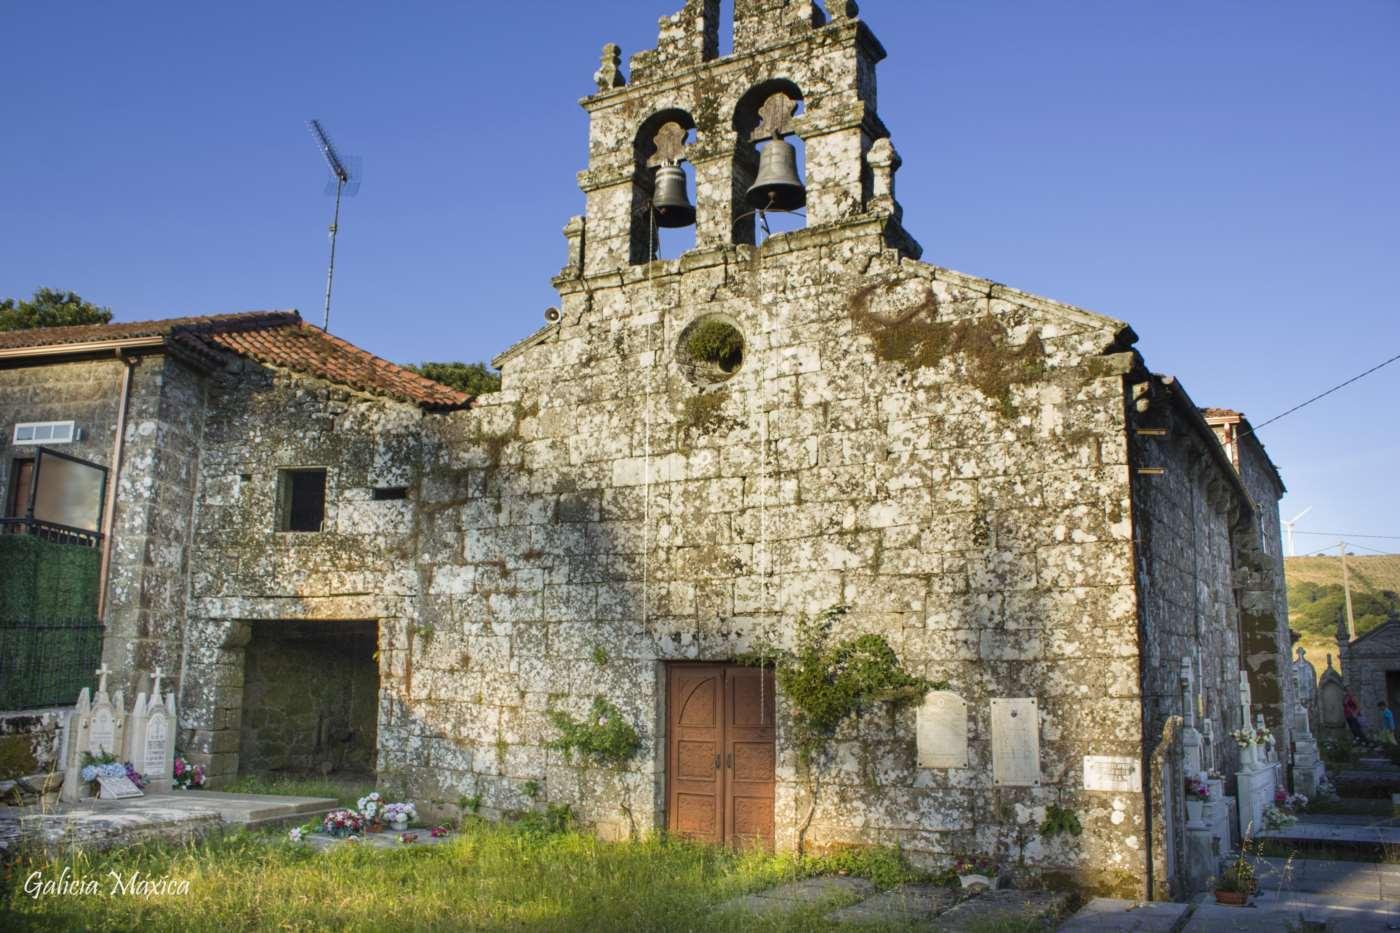 Iglesia y Casa Fortaleza de Camba